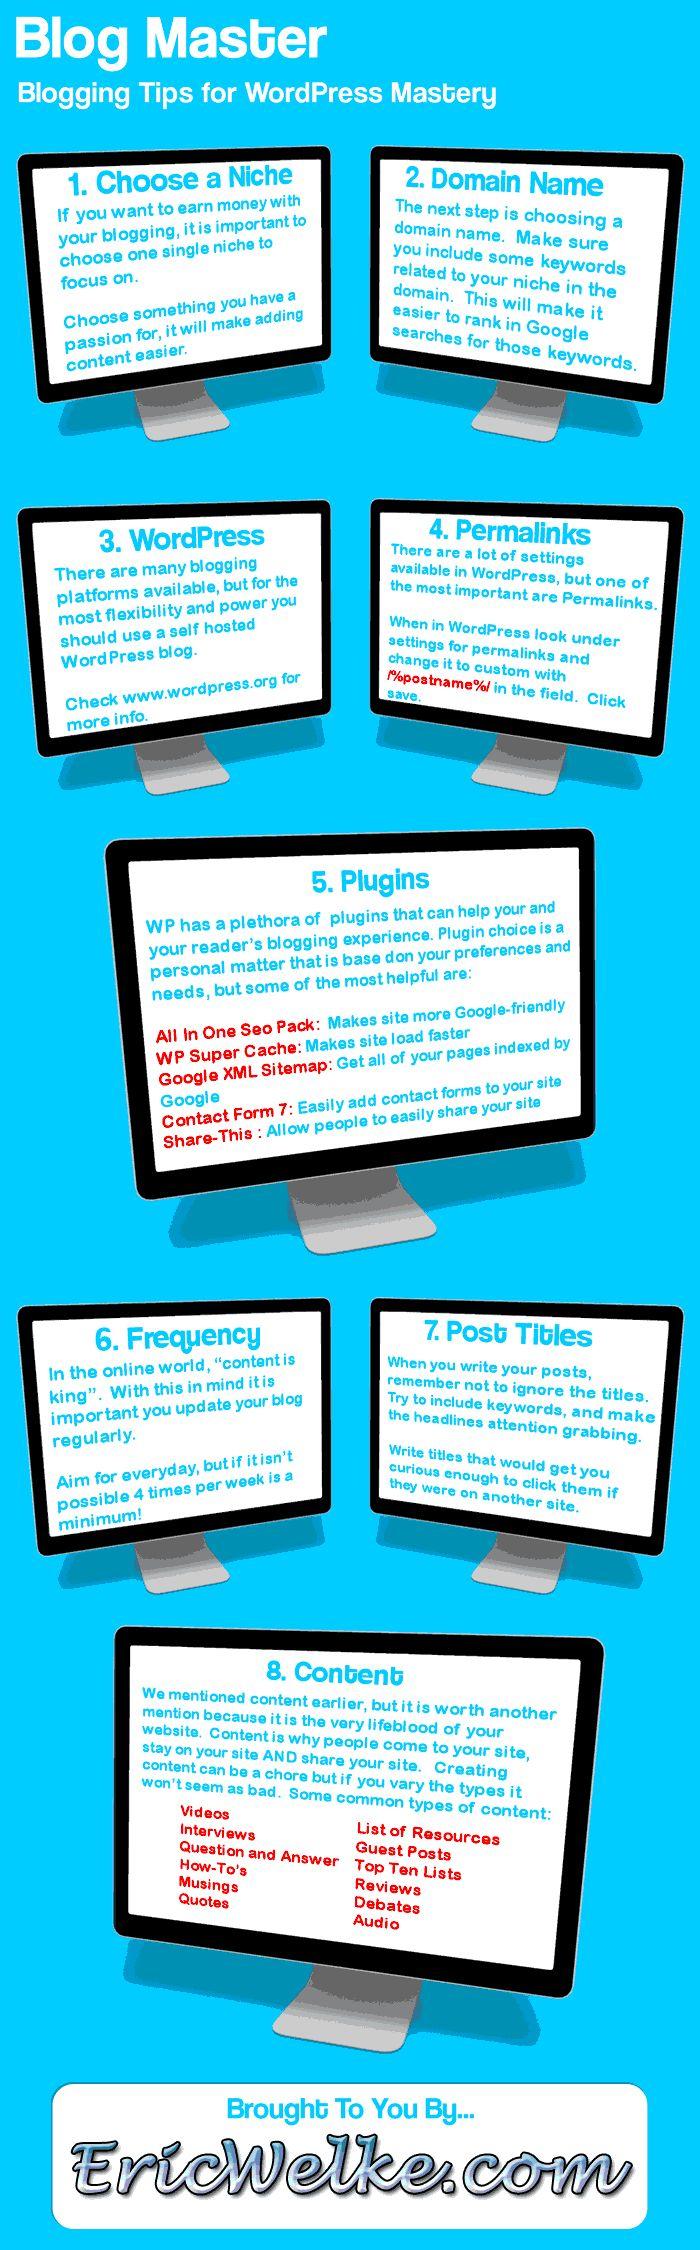 Blogging Tips for WordPress Mastery